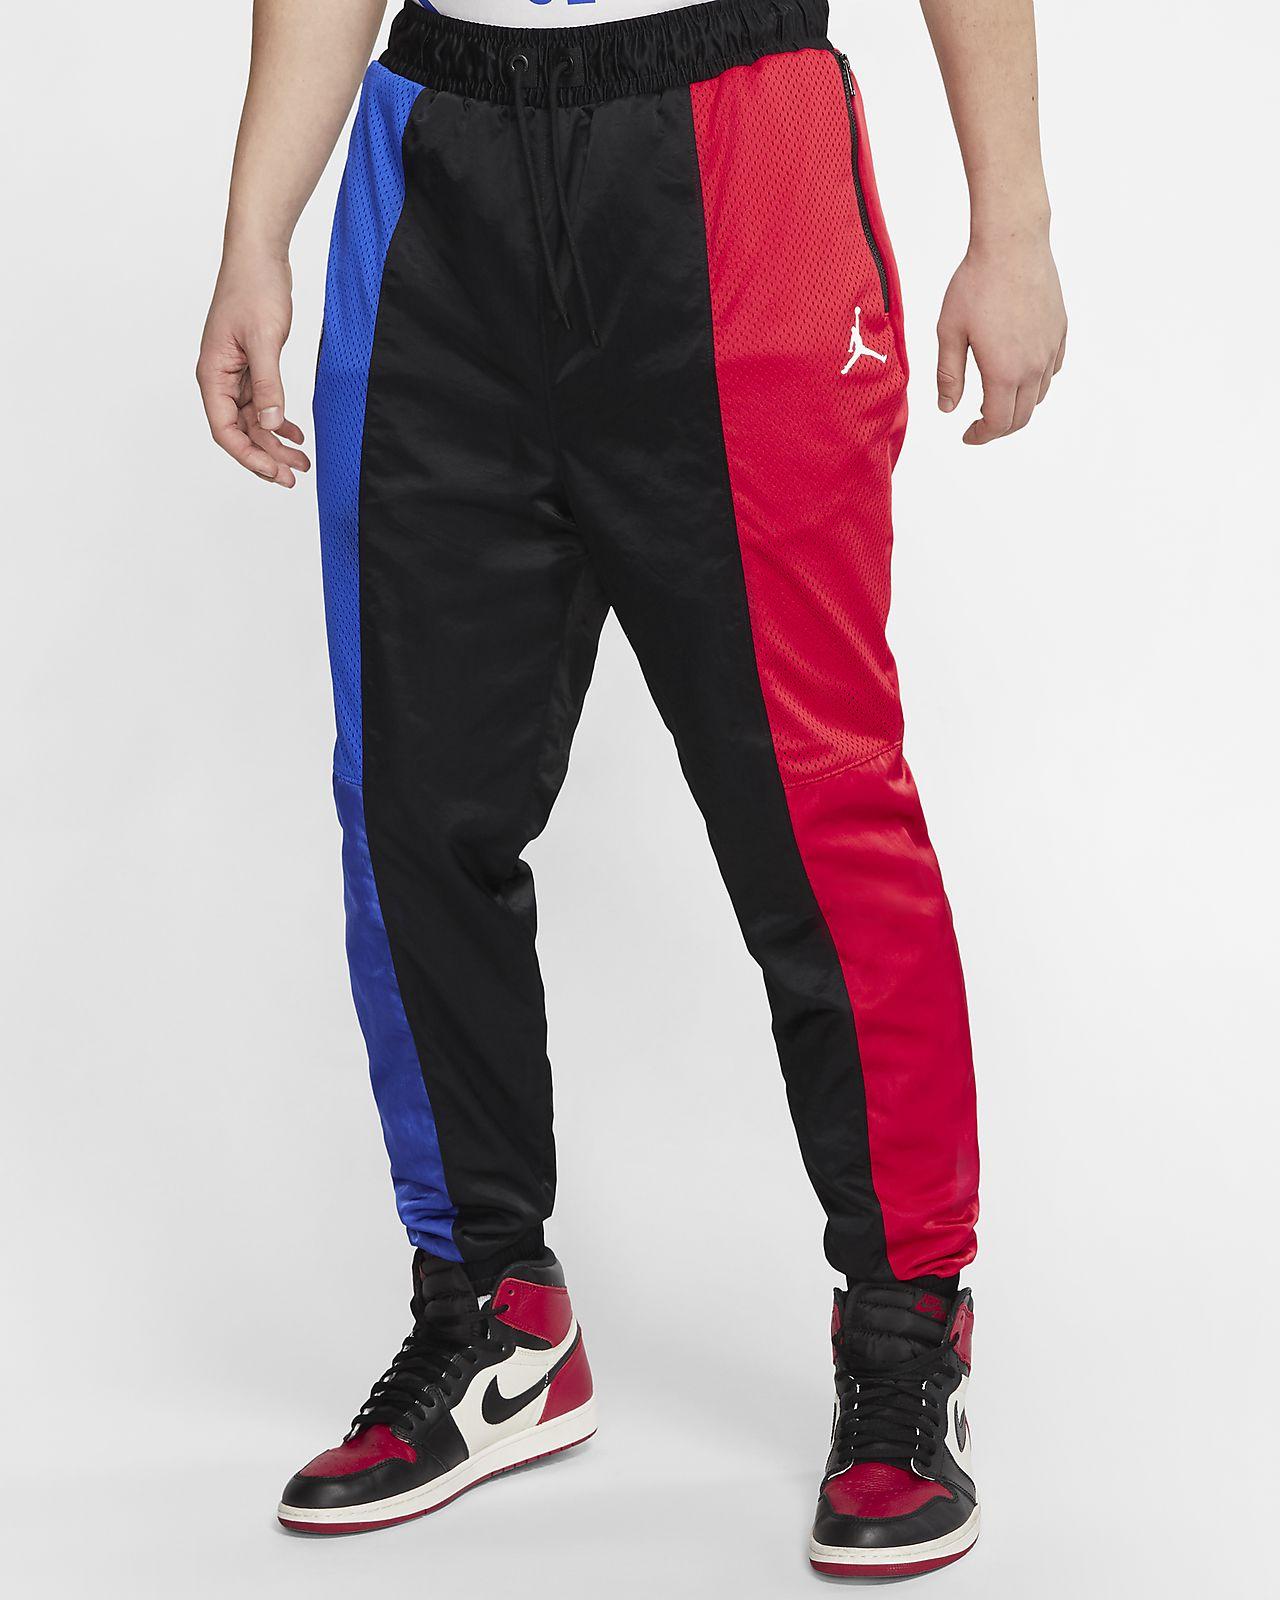 Paris Saint-Germain Men's Pants